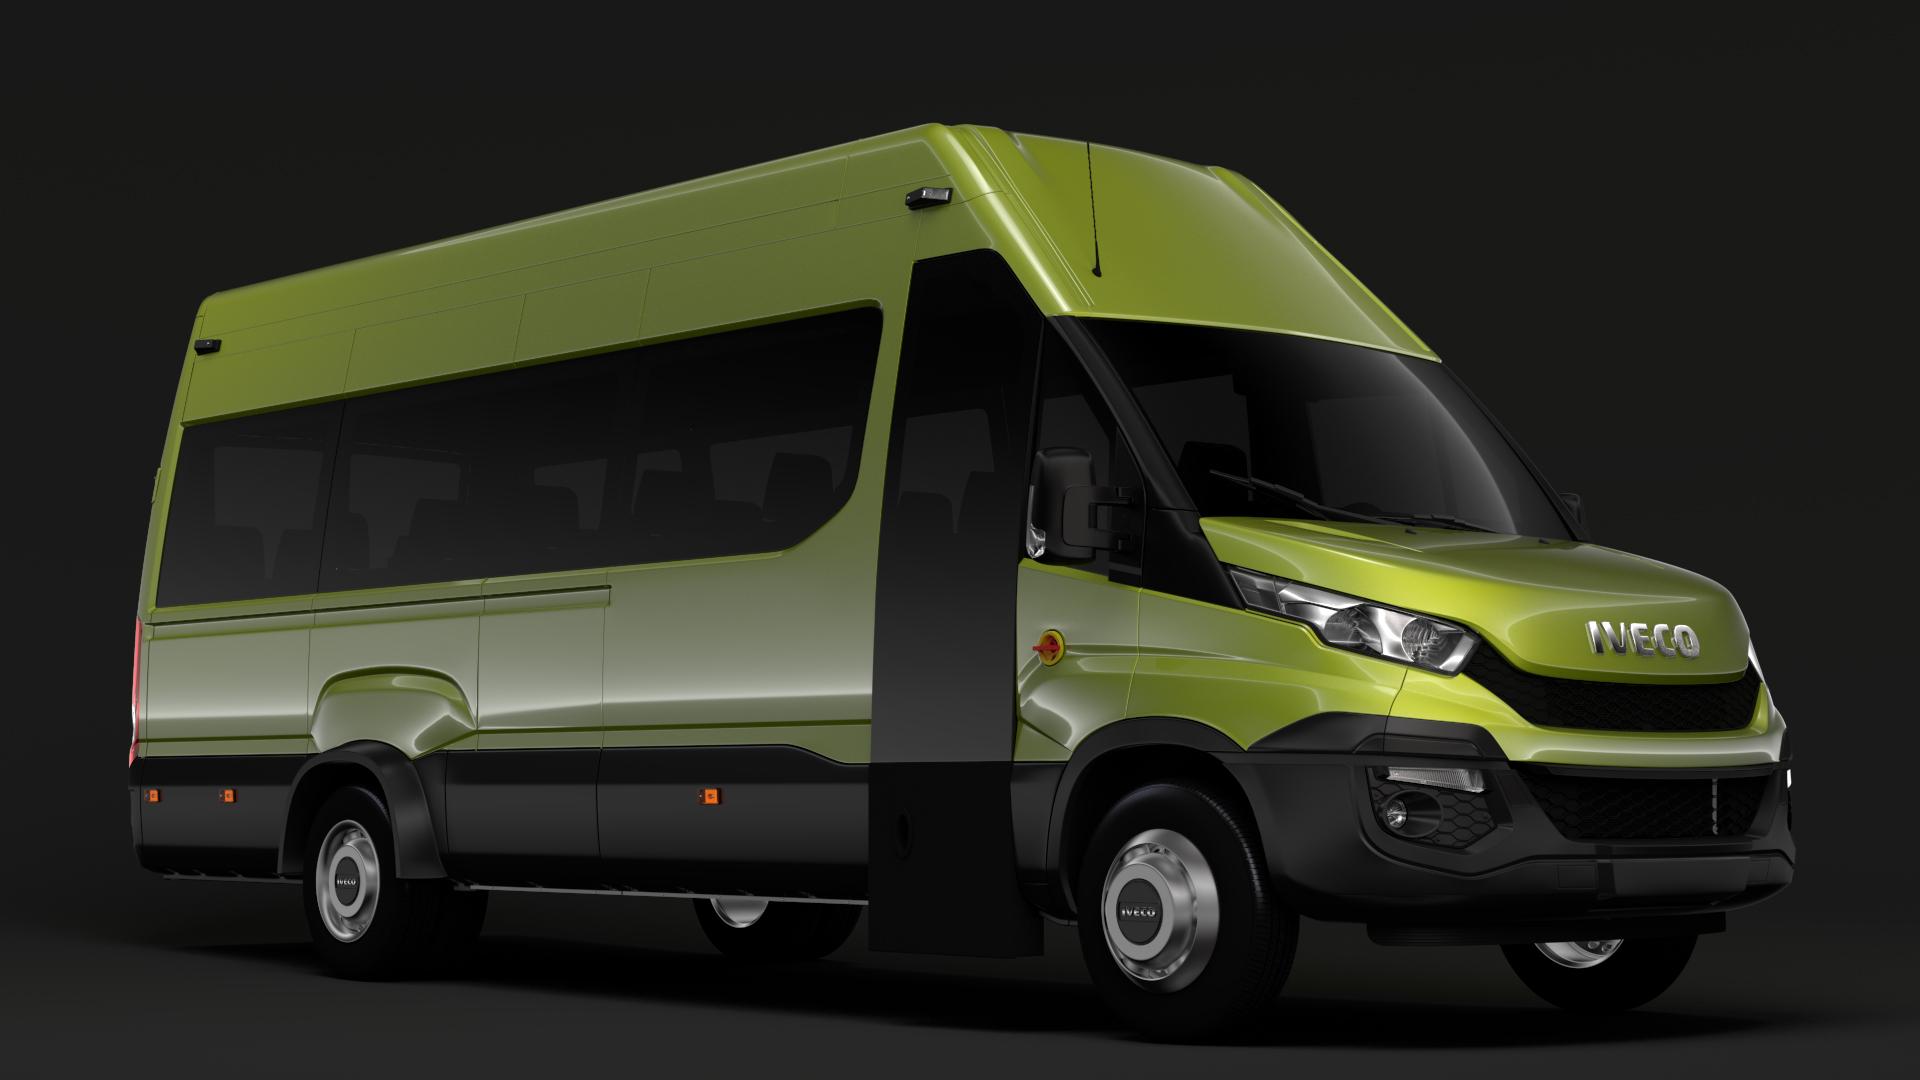 iveco daily tourus l4h3 2014-2016 3d model max fbx c4d lwo ma mb hrc xsi obj 276233